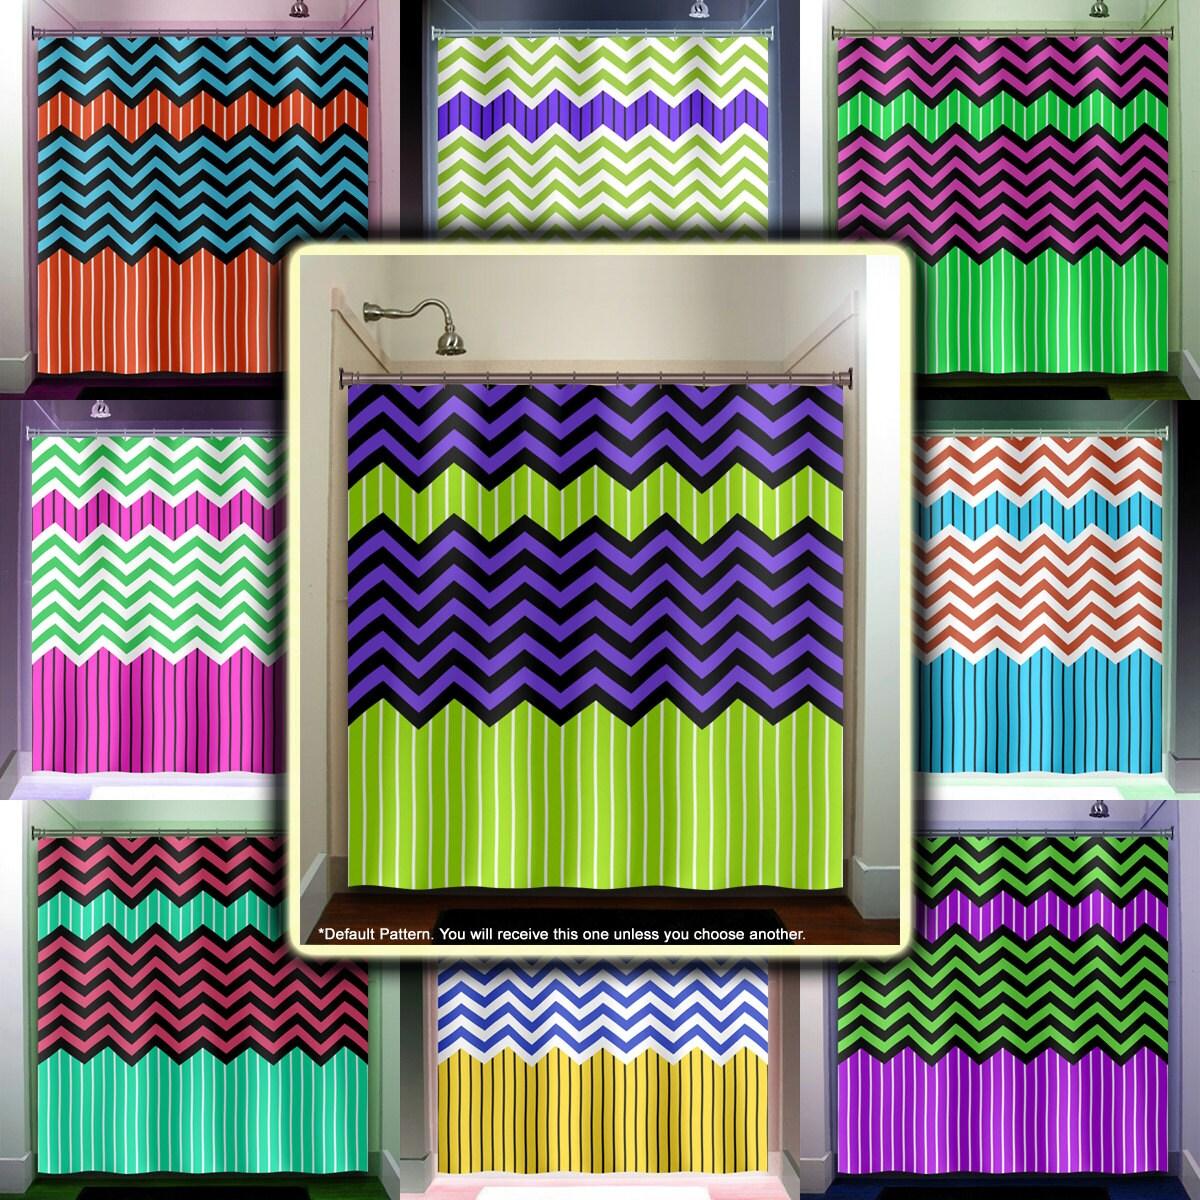 Ganma Green Chevron Shower Curtain Polyester Fabric Bathroom 66x72 ...